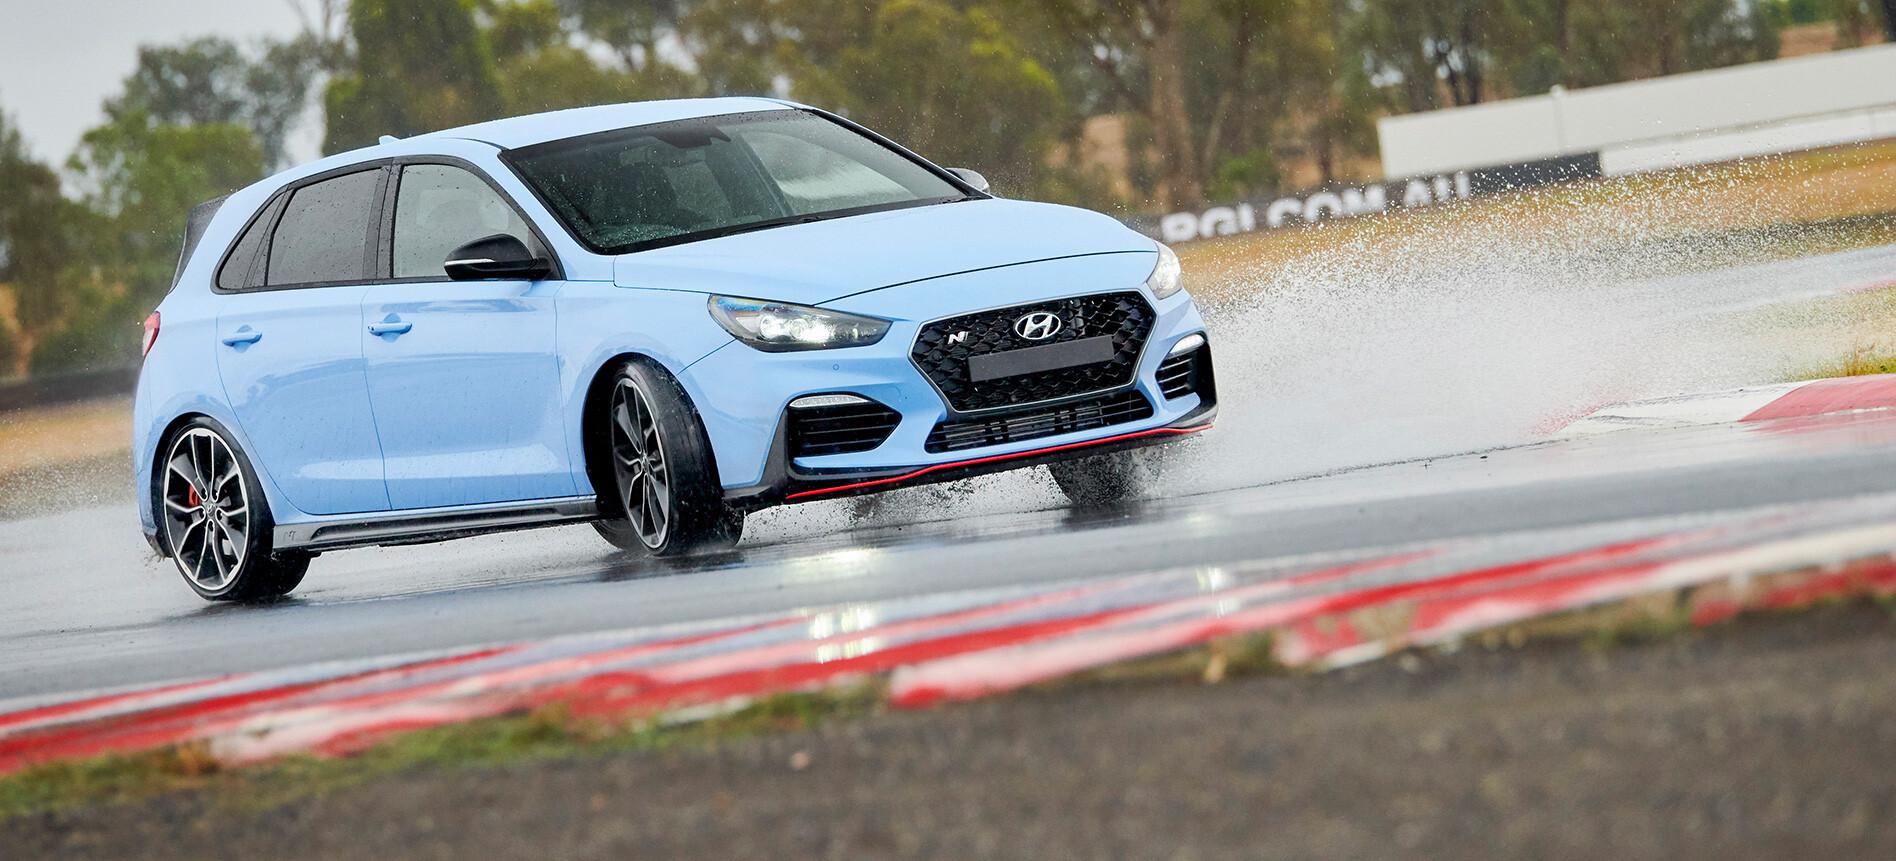 Hyundai announces track-proof warranty for i30 N